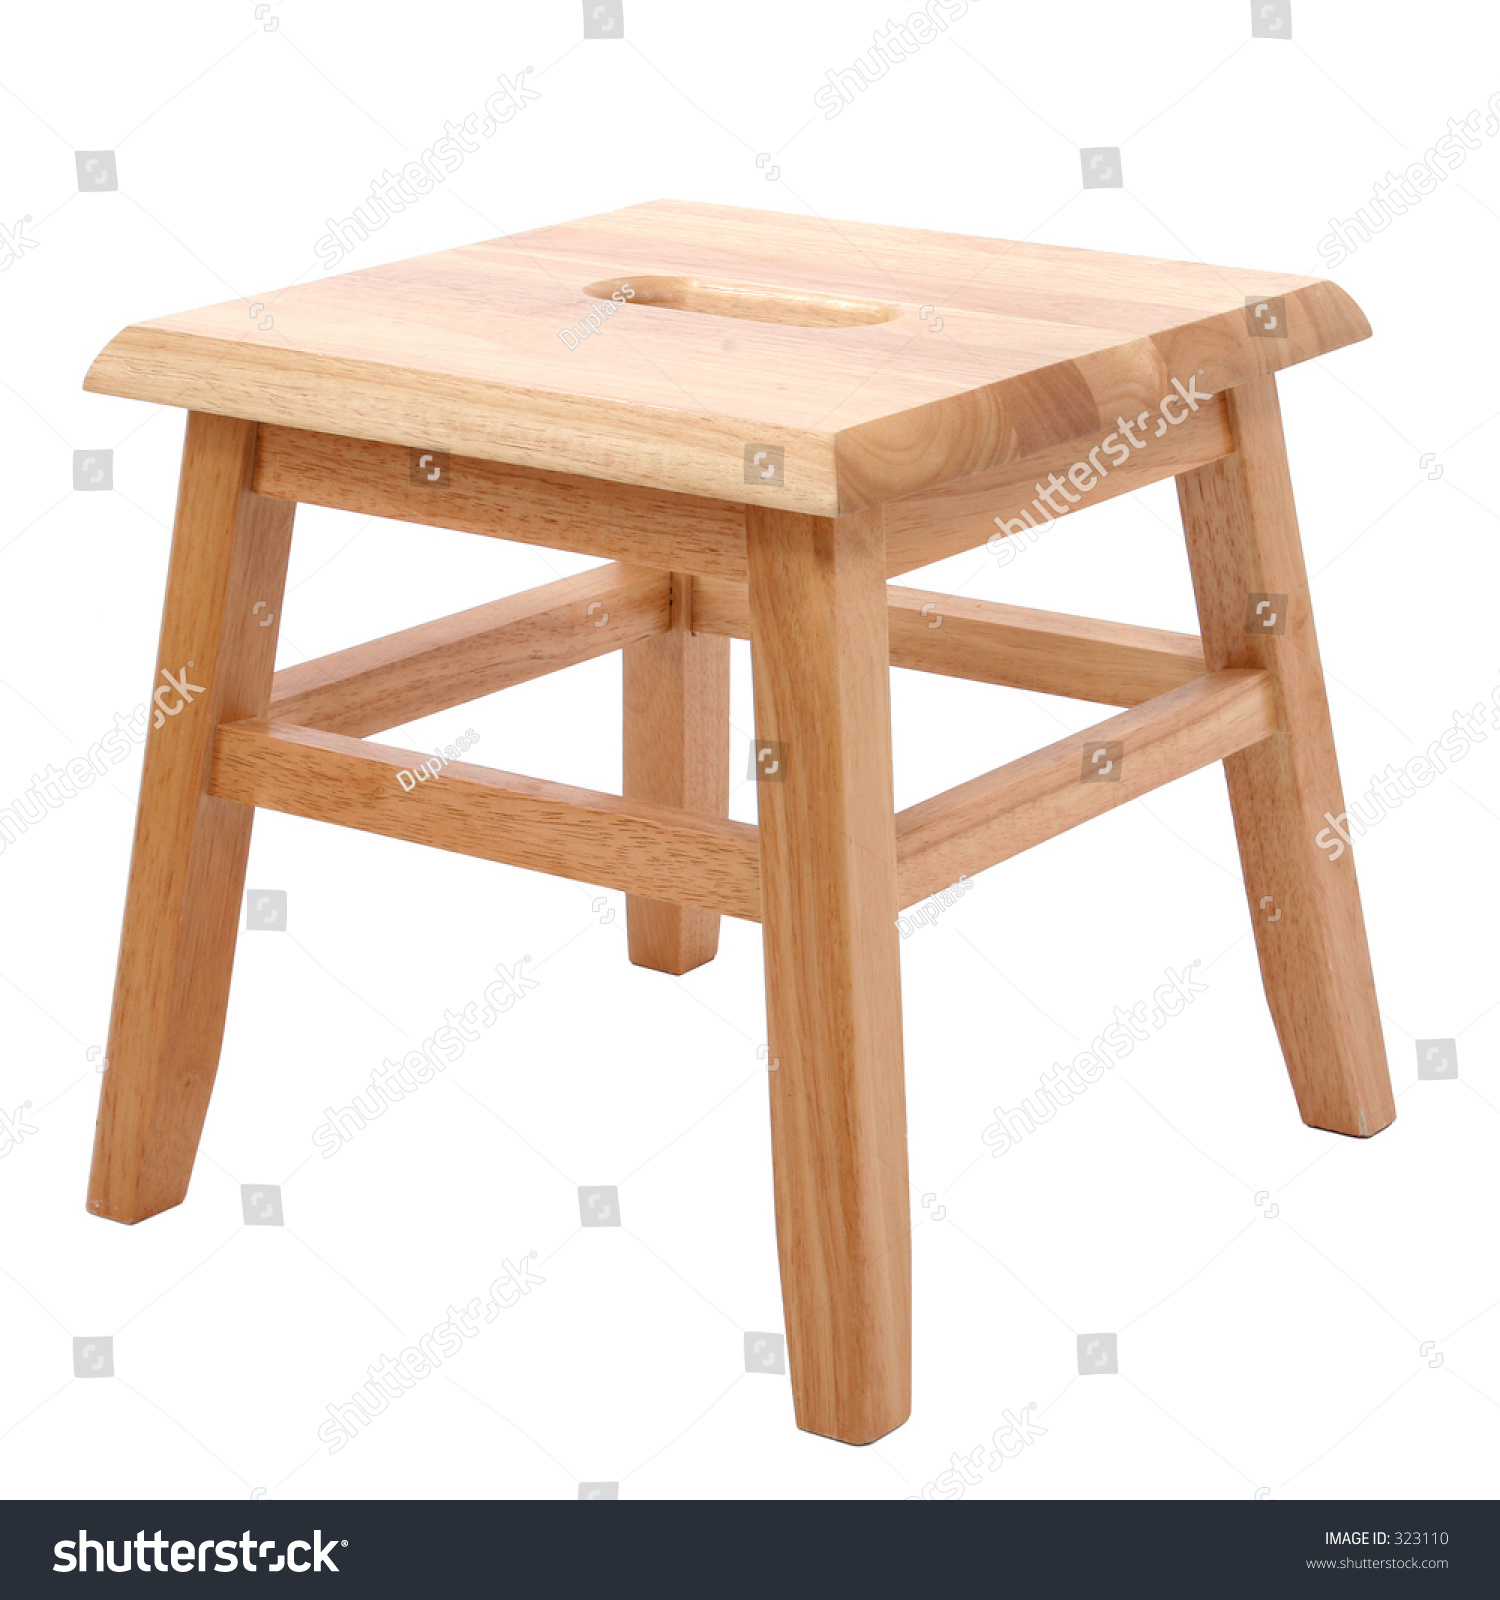 Small Four Legged Wooden Step Stool Over White Stock